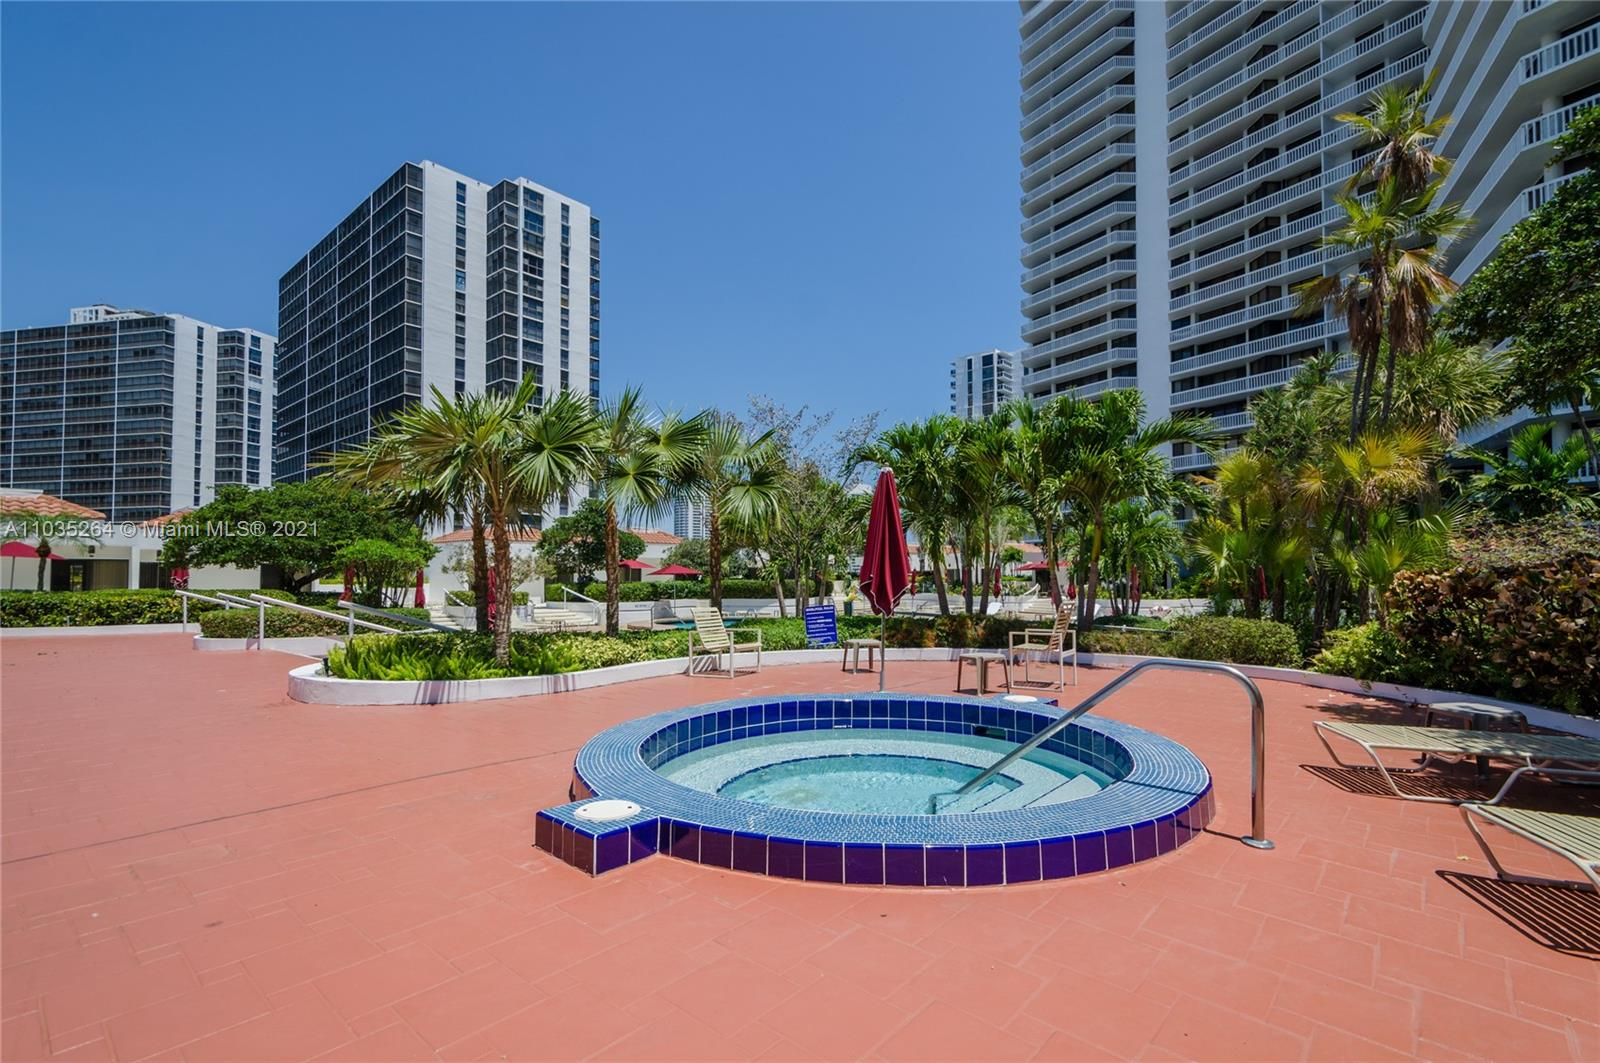 Photo of 20281 Country Club Dr #215, Aventura, Florida, 33180 -